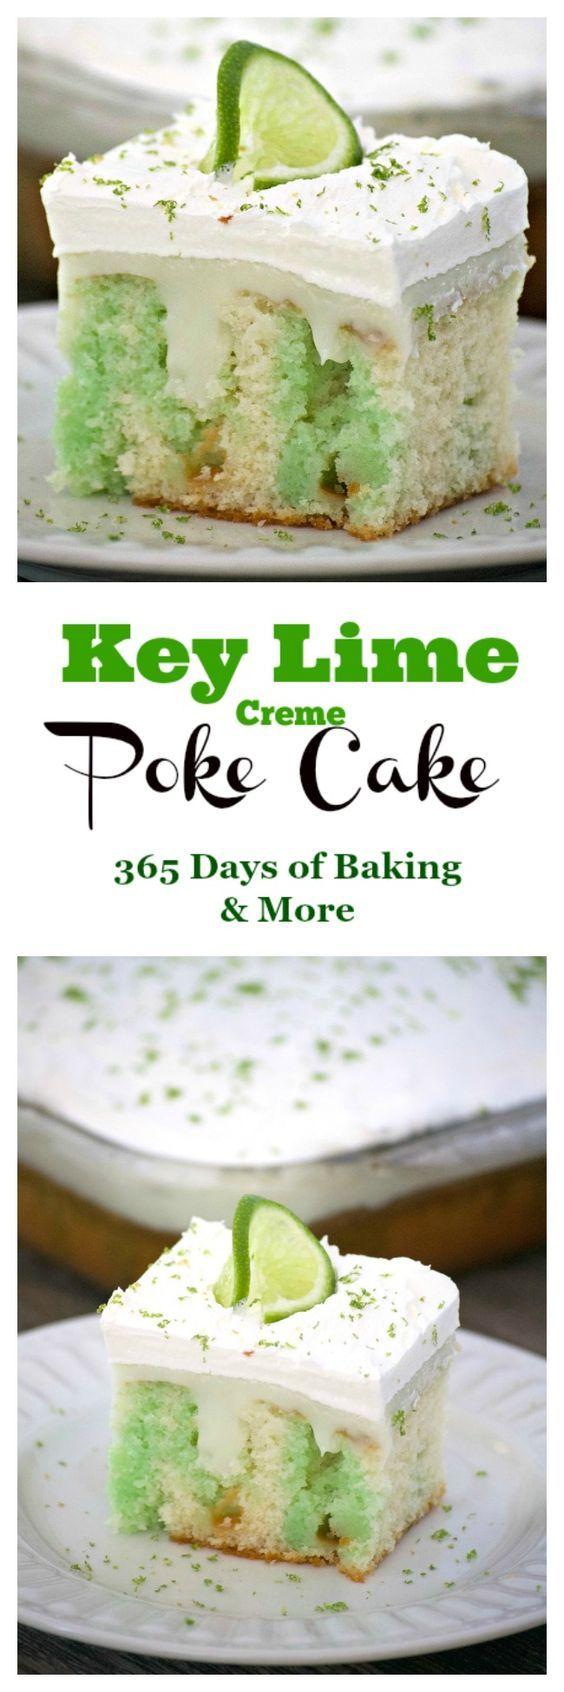 Key Lime Creme Poke Cake   Recipe